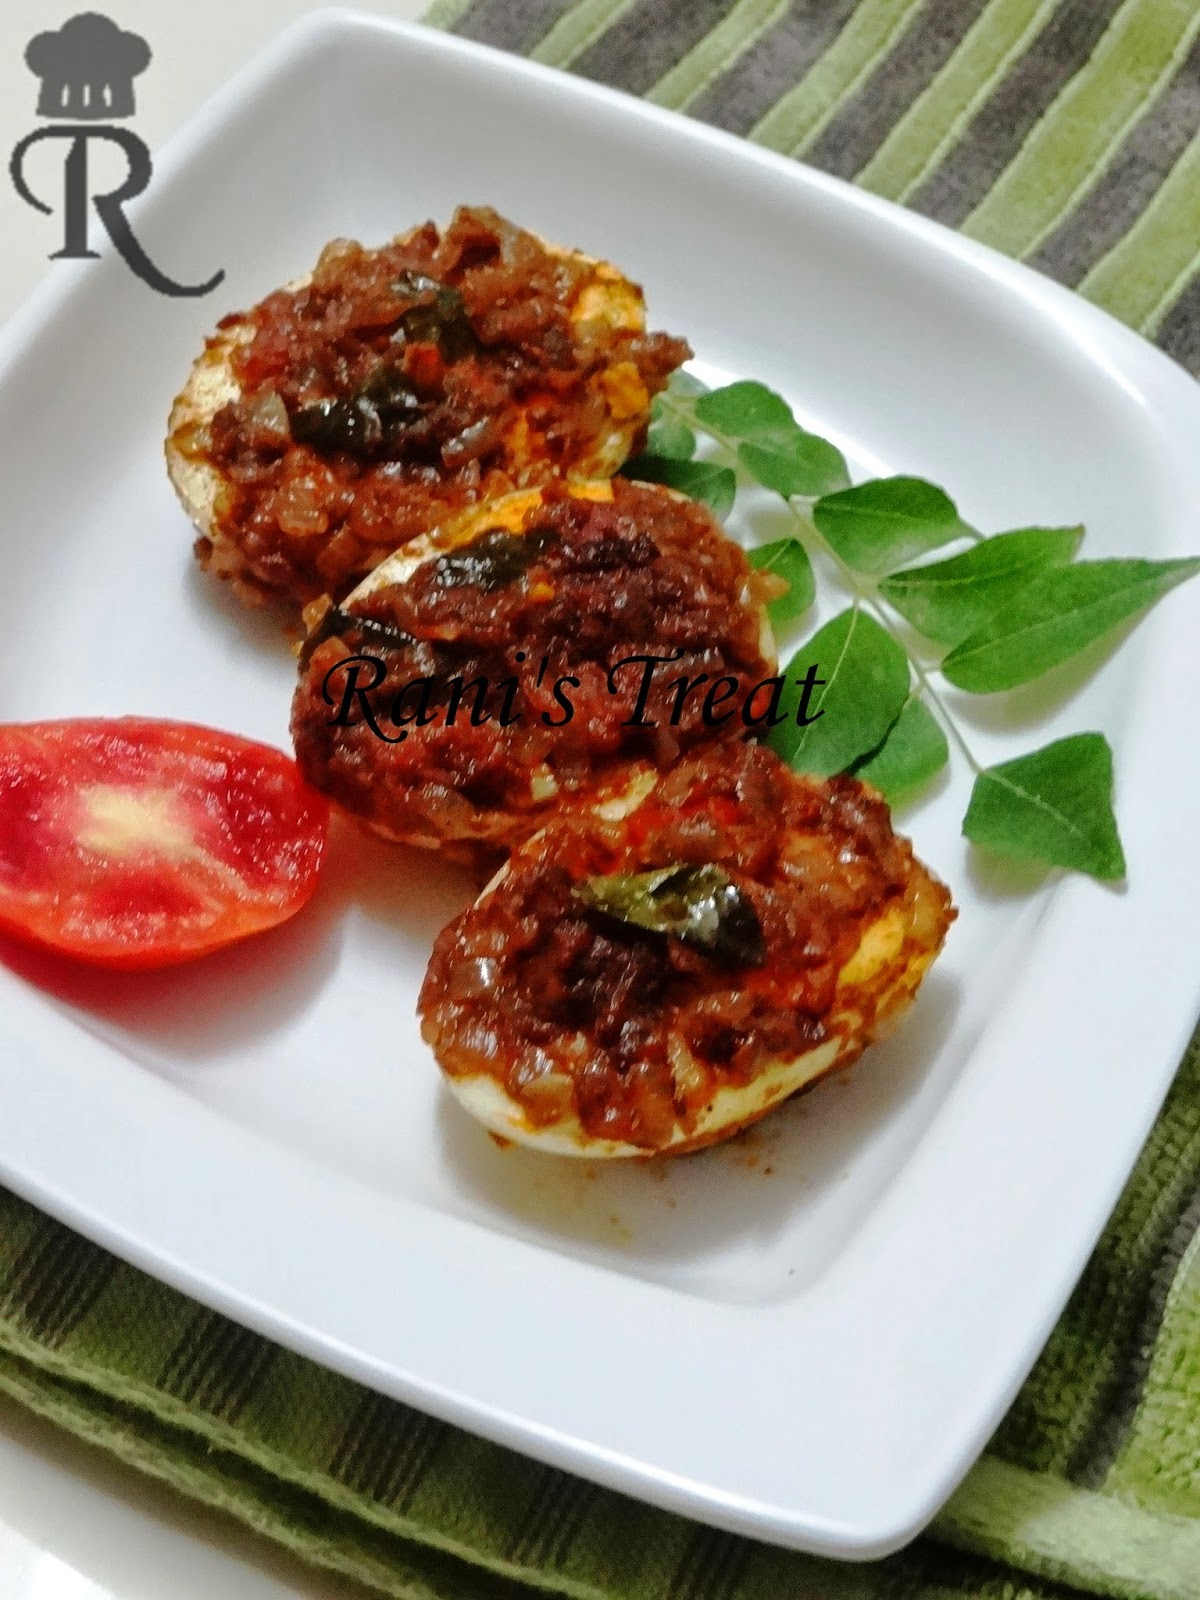 Spicy Egg Fry | Muttai Varuval | ஈஸி முட்டை வறுவல்